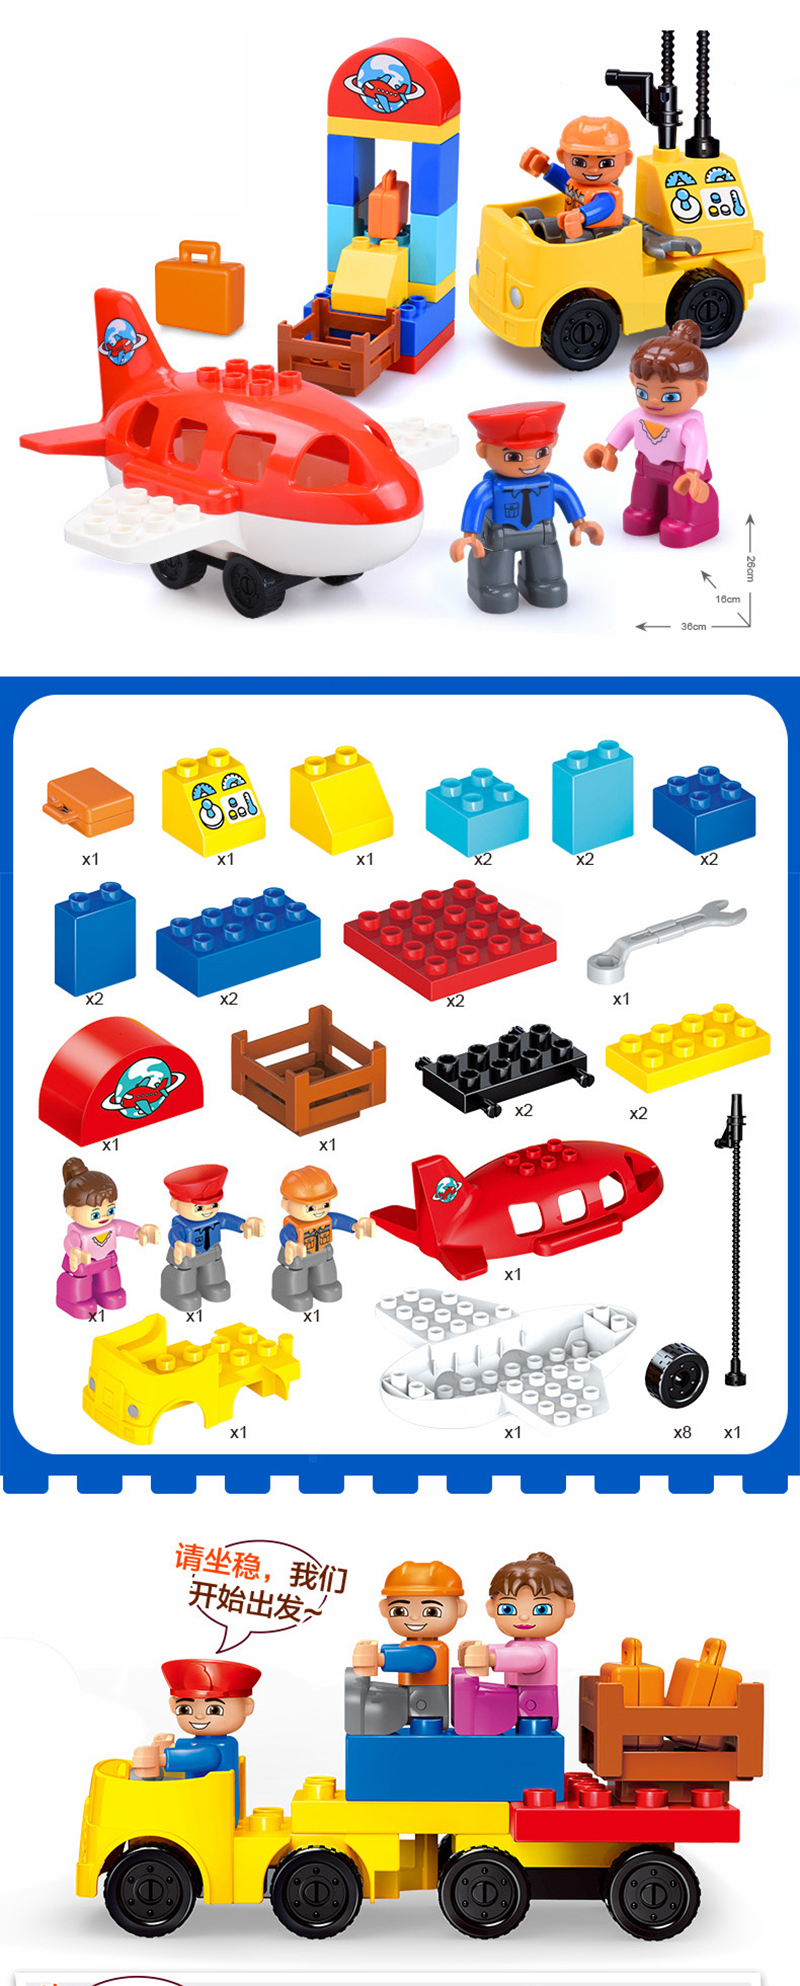 13-109pcs Large particles City Transport Team Car Model Series Building Block Bricks Compatible Duploe Toys for children Kids GIft (4)